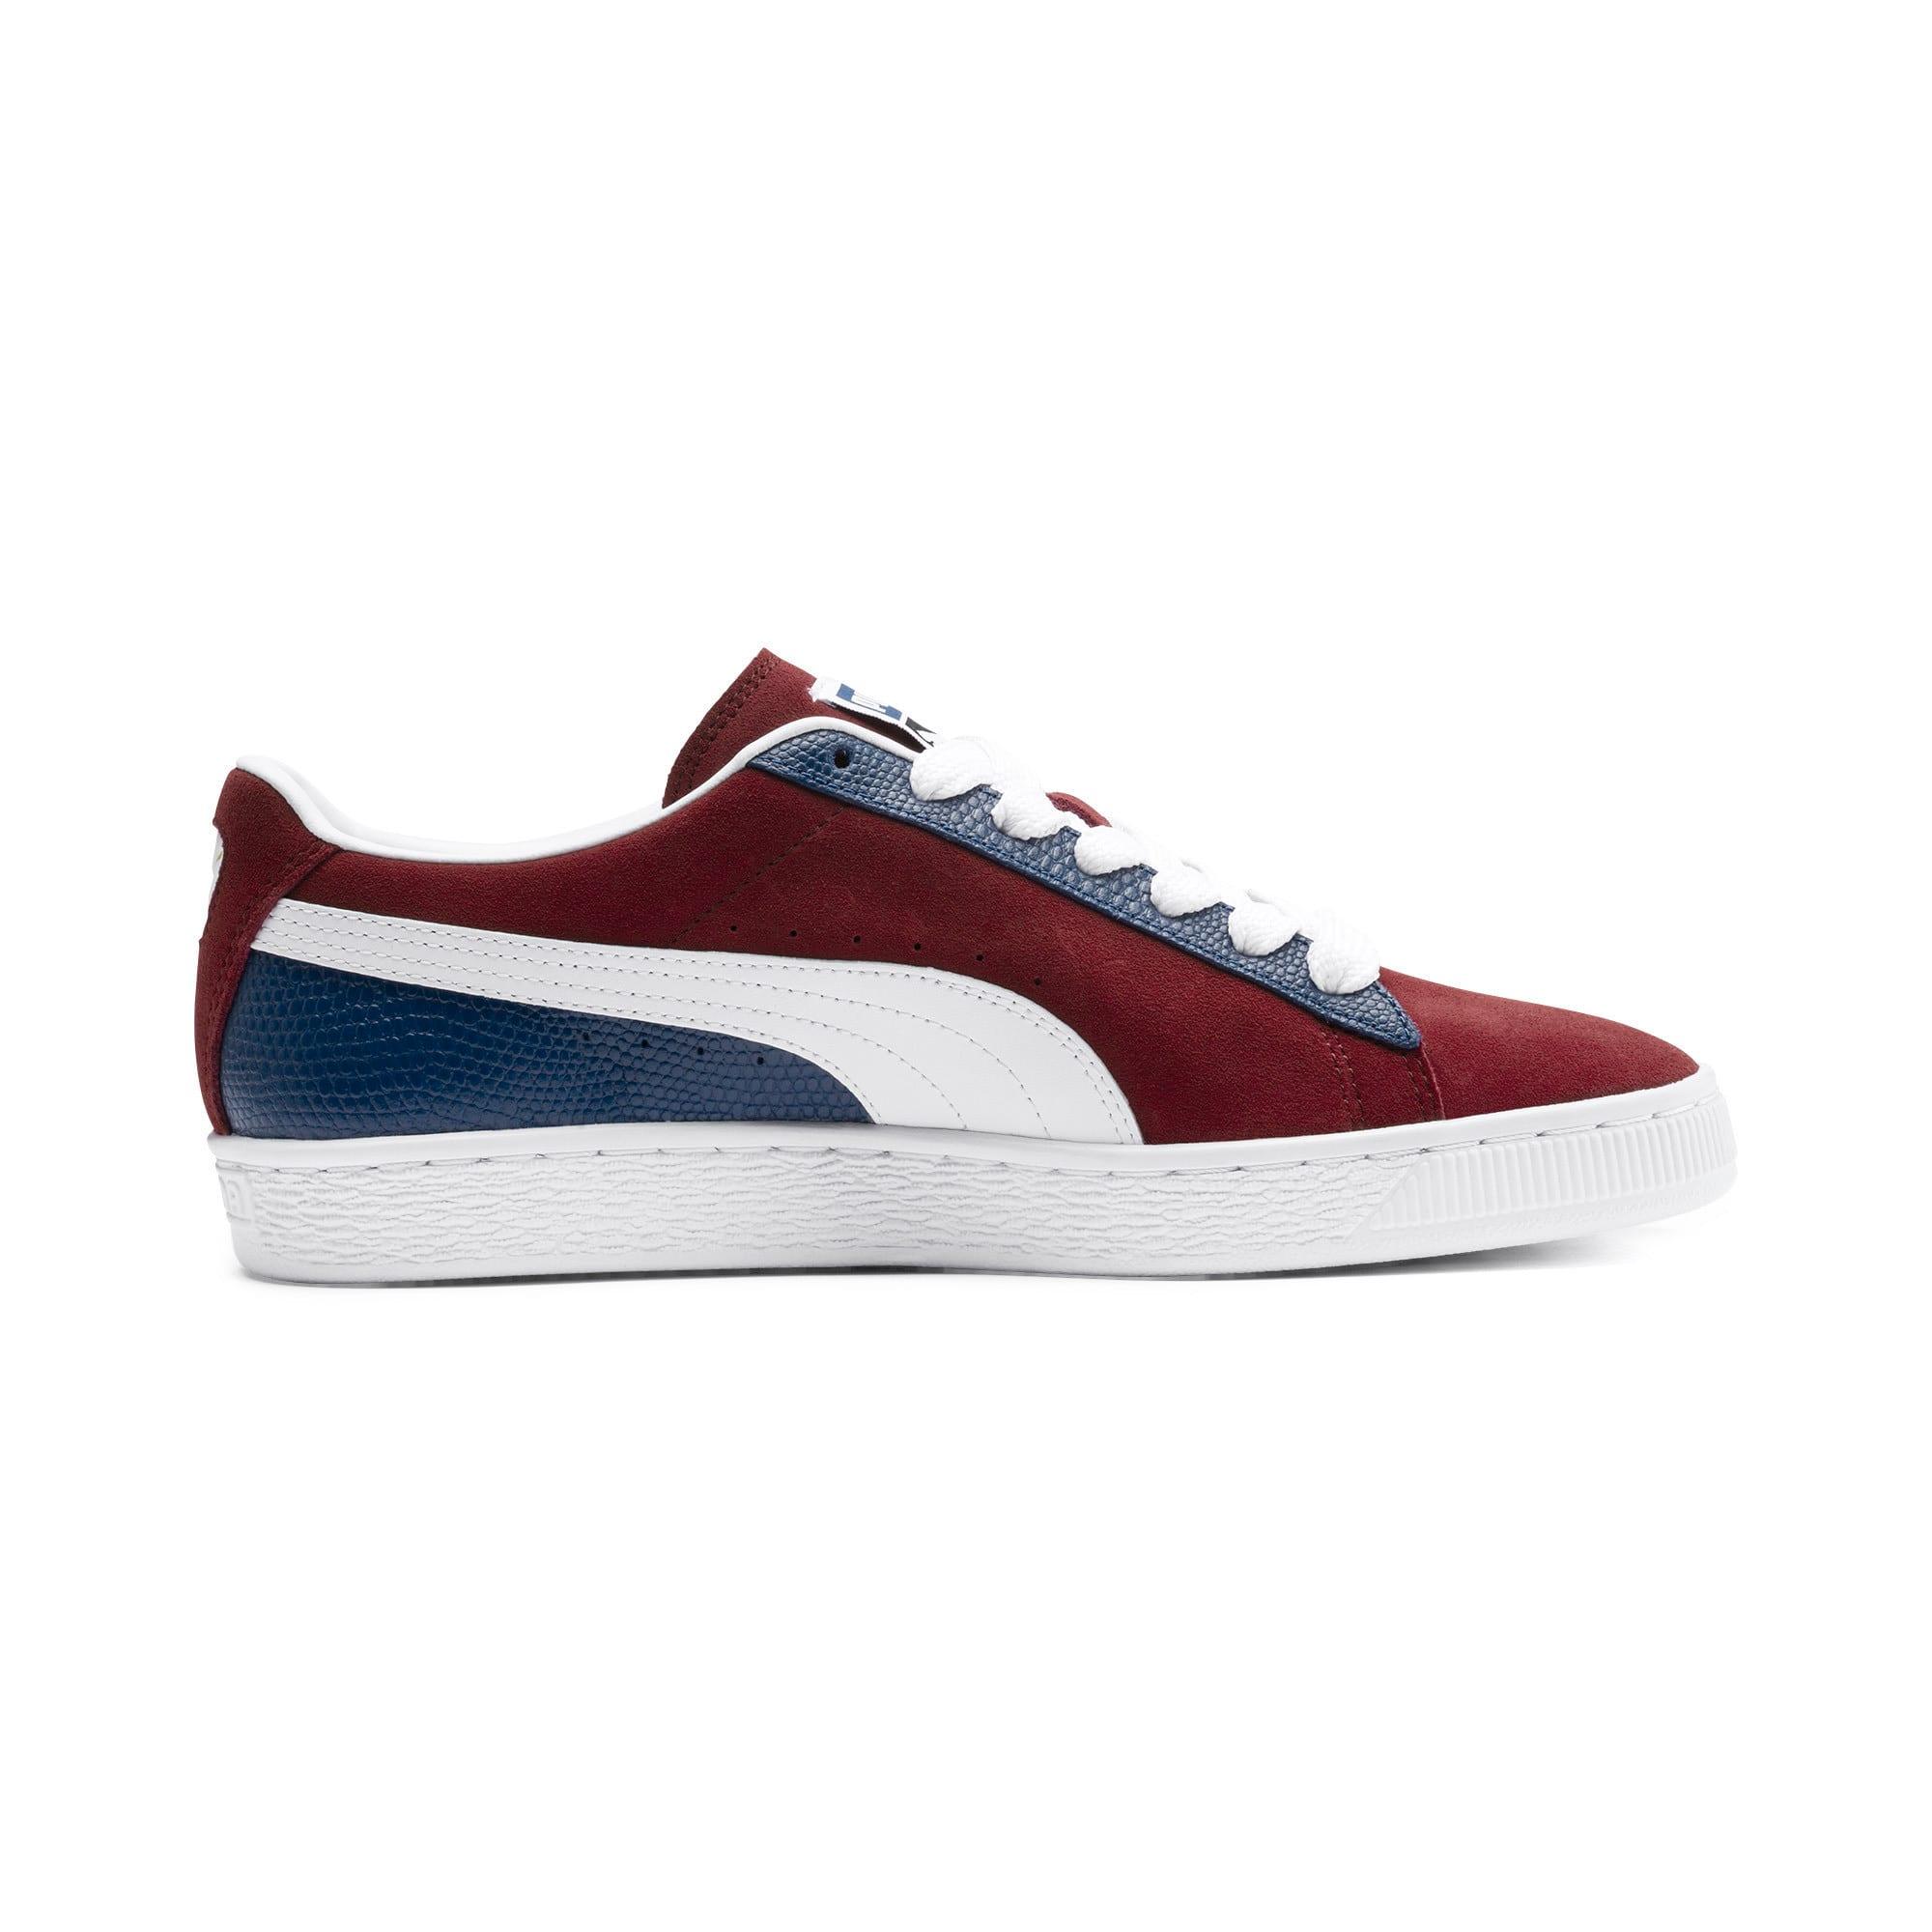 Thumbnail 6 of Suede Classic Block Sneakers, Rhubarb- Blue-White, medium